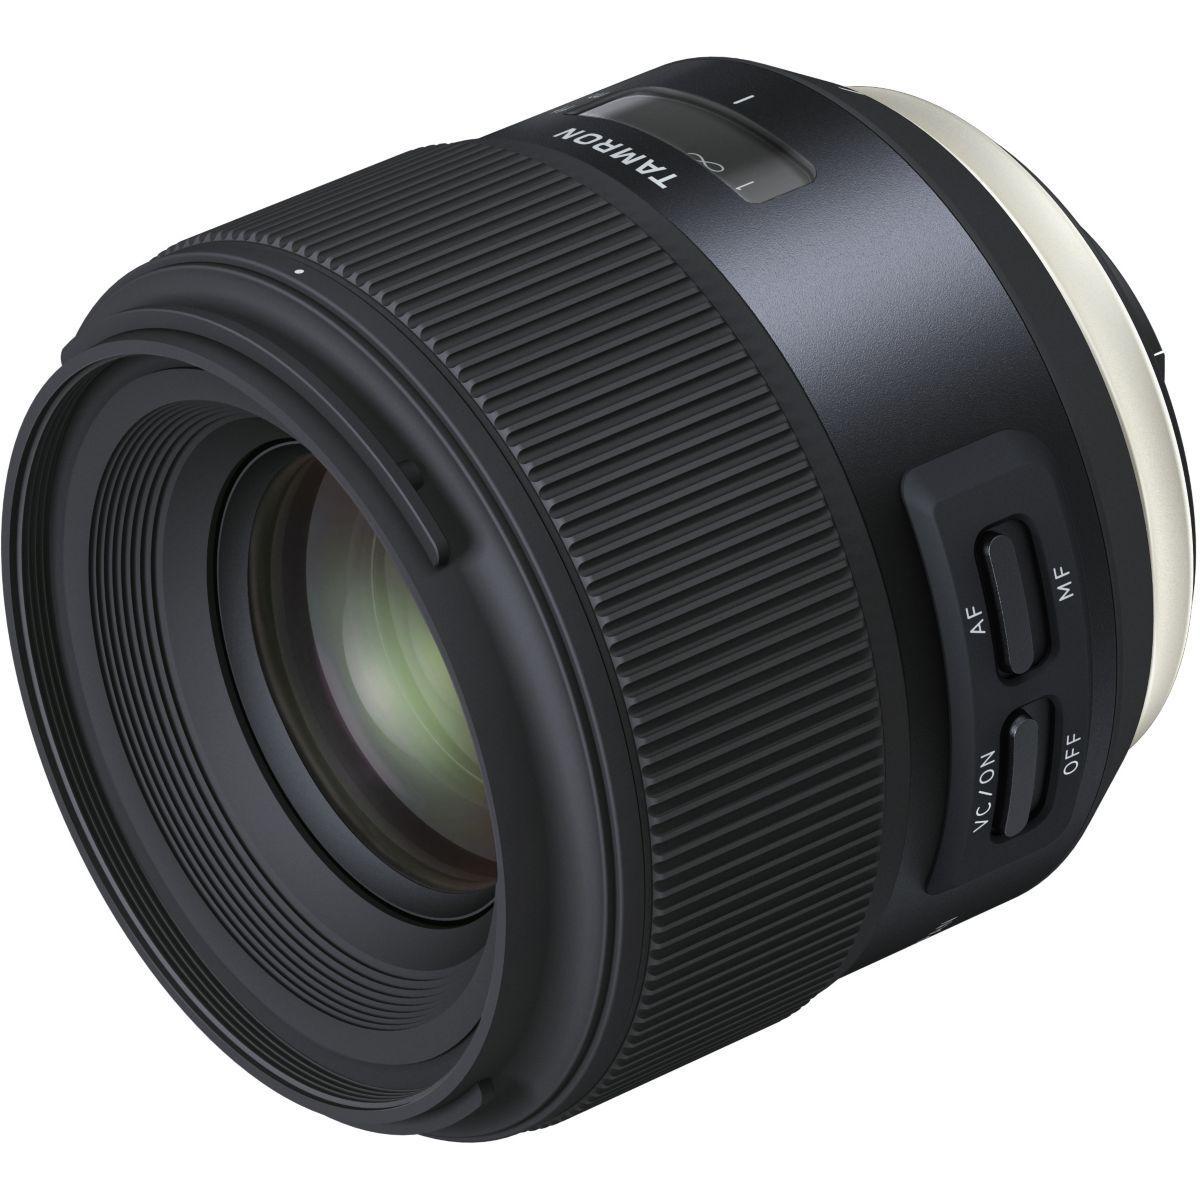 Objectif tamron sp 35 mm f/1,8 di vc usd nikon - produit coup de coeur webdistrib.com !